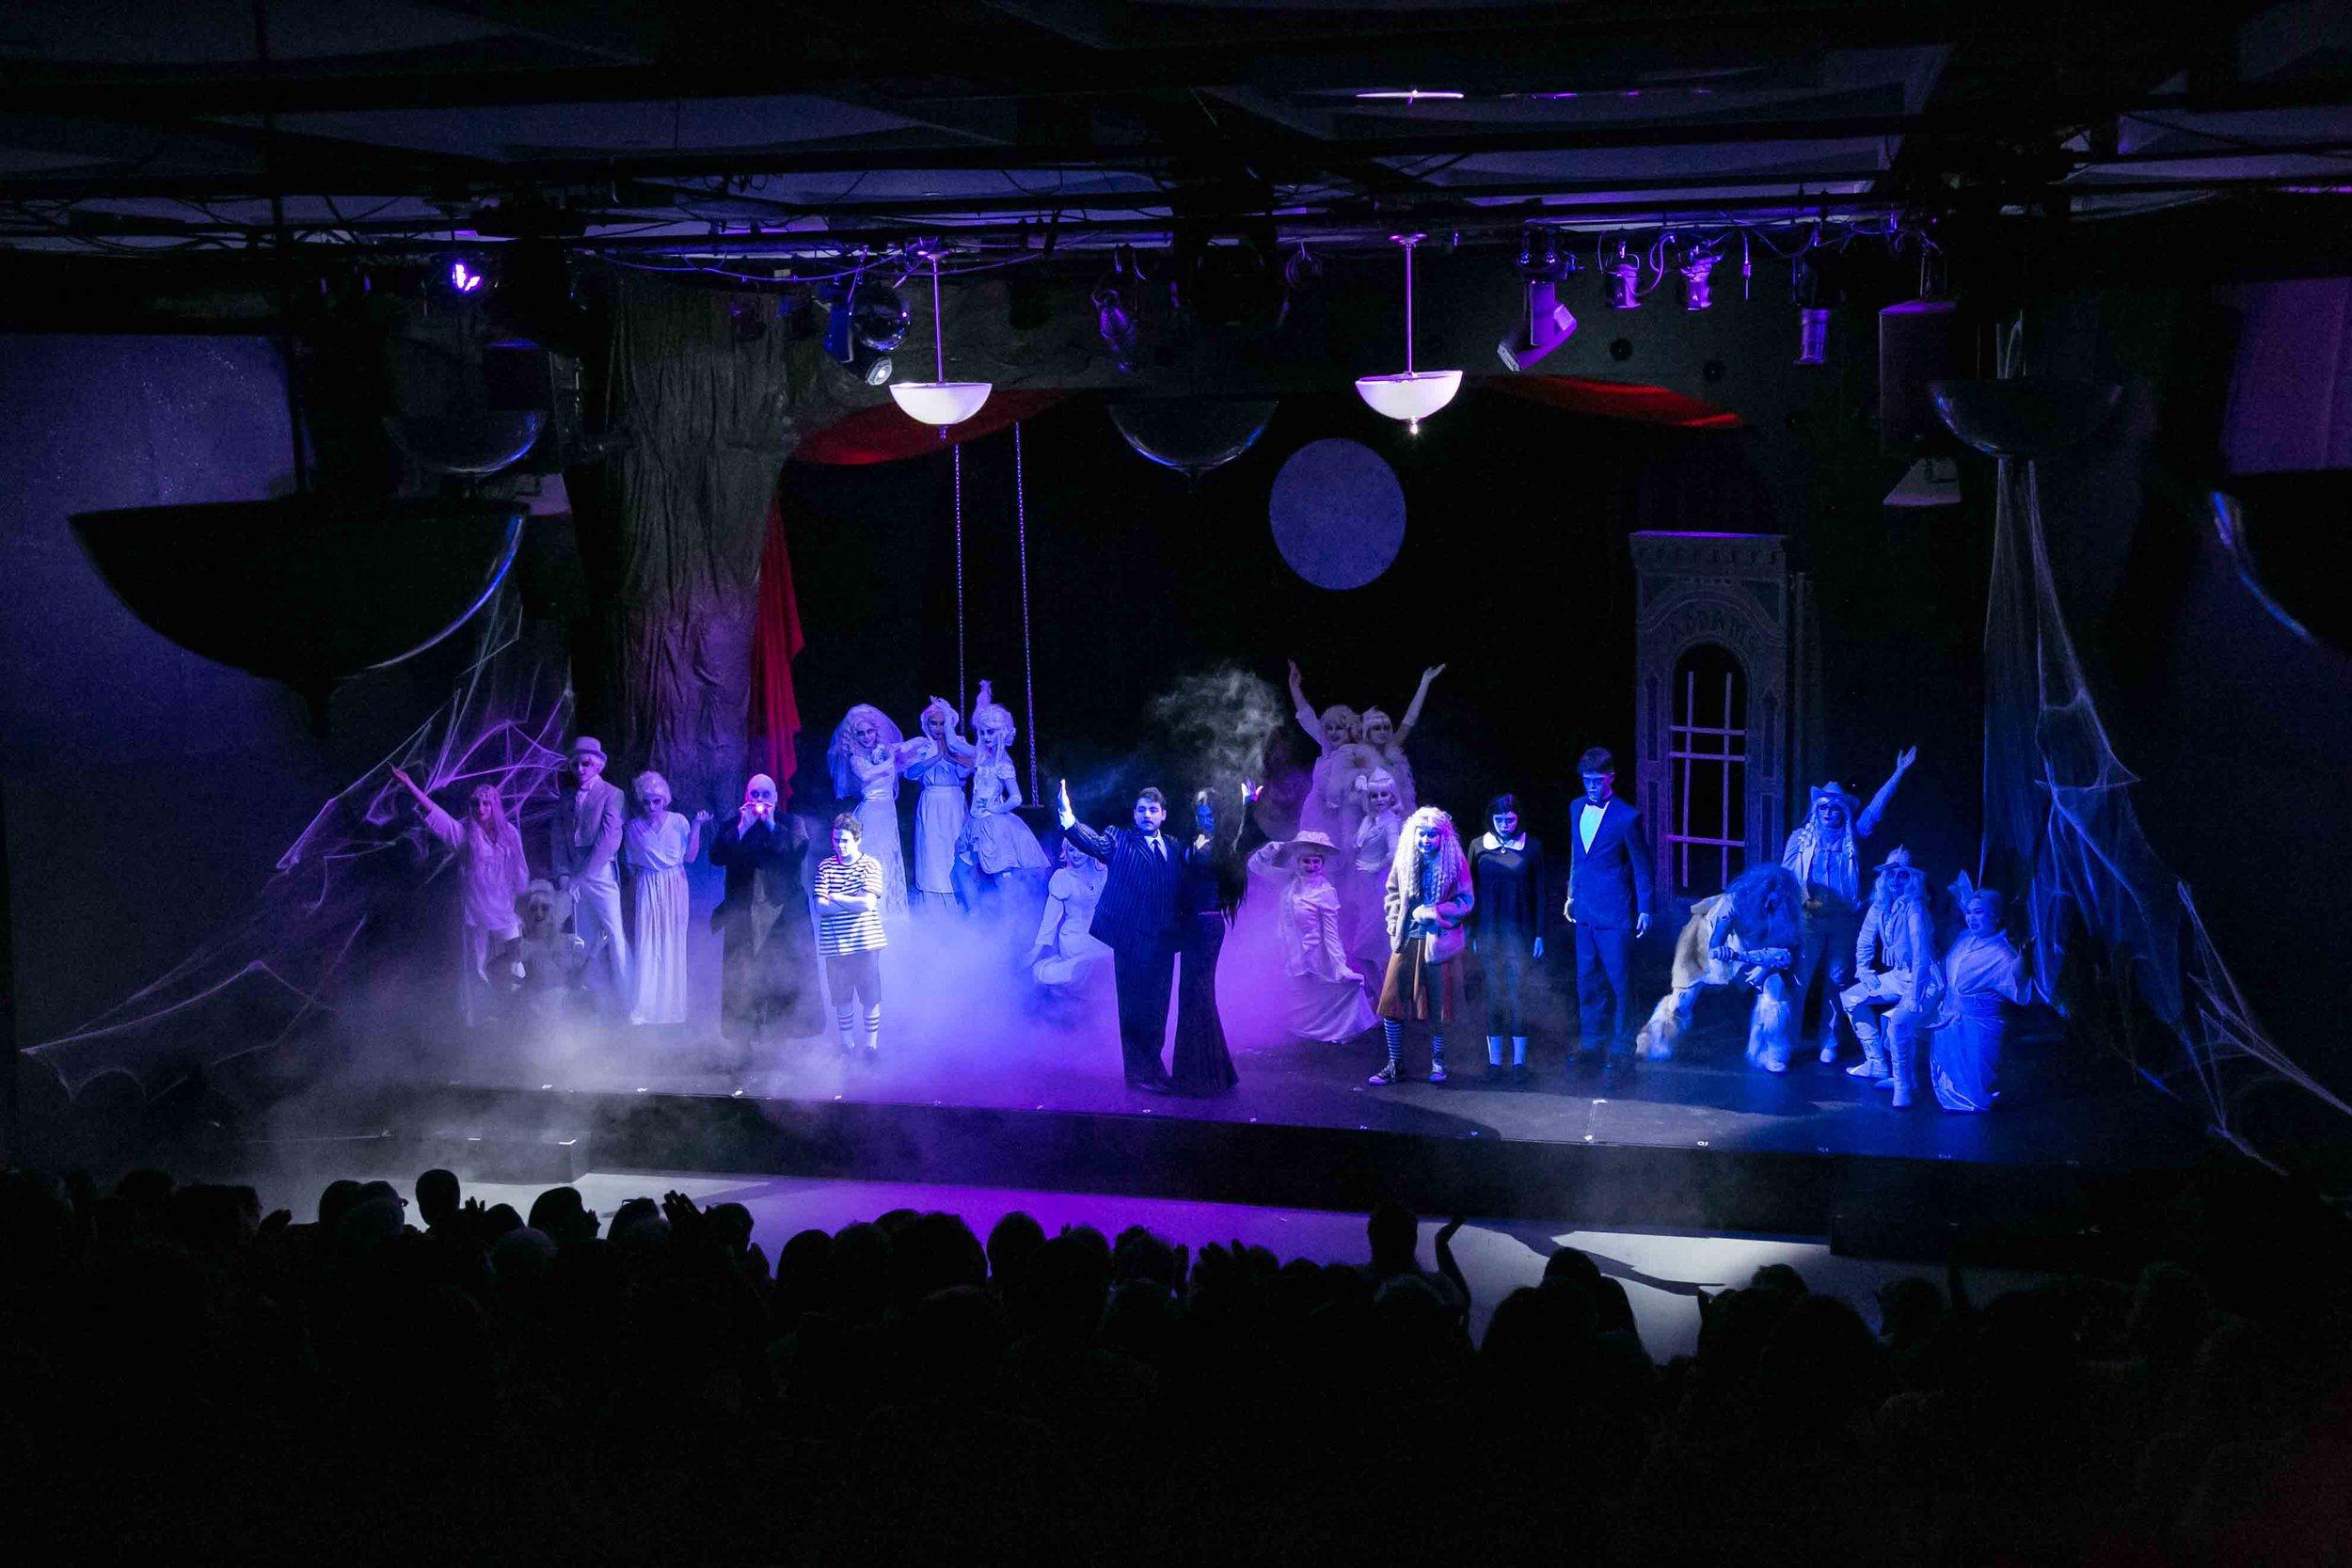 6-19-16 Addams Family Kooky Cast 0050.jpg